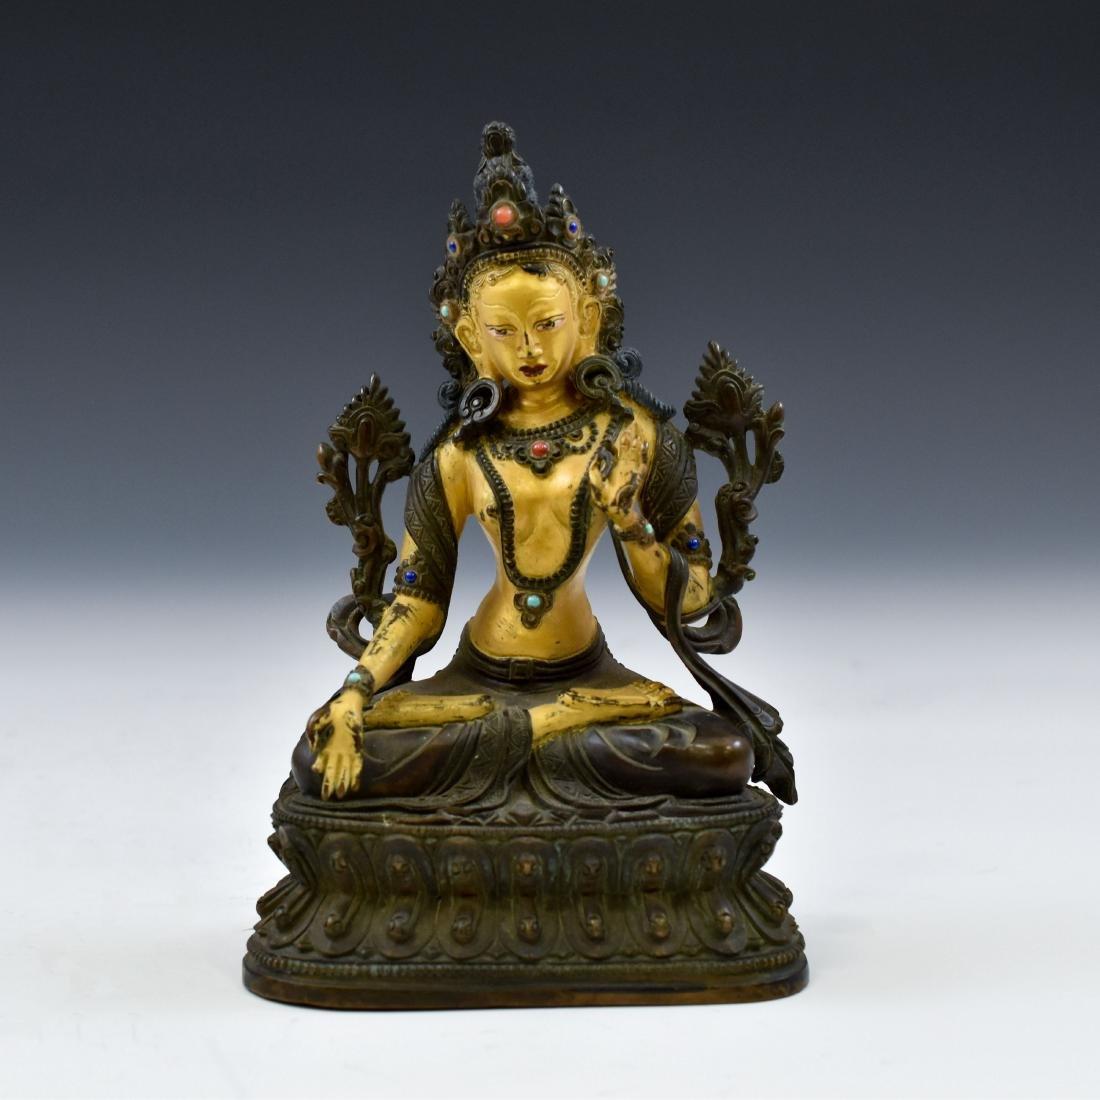 QING COLD GILT BRONZE INLAID BUDDHA OF GREEN TARA